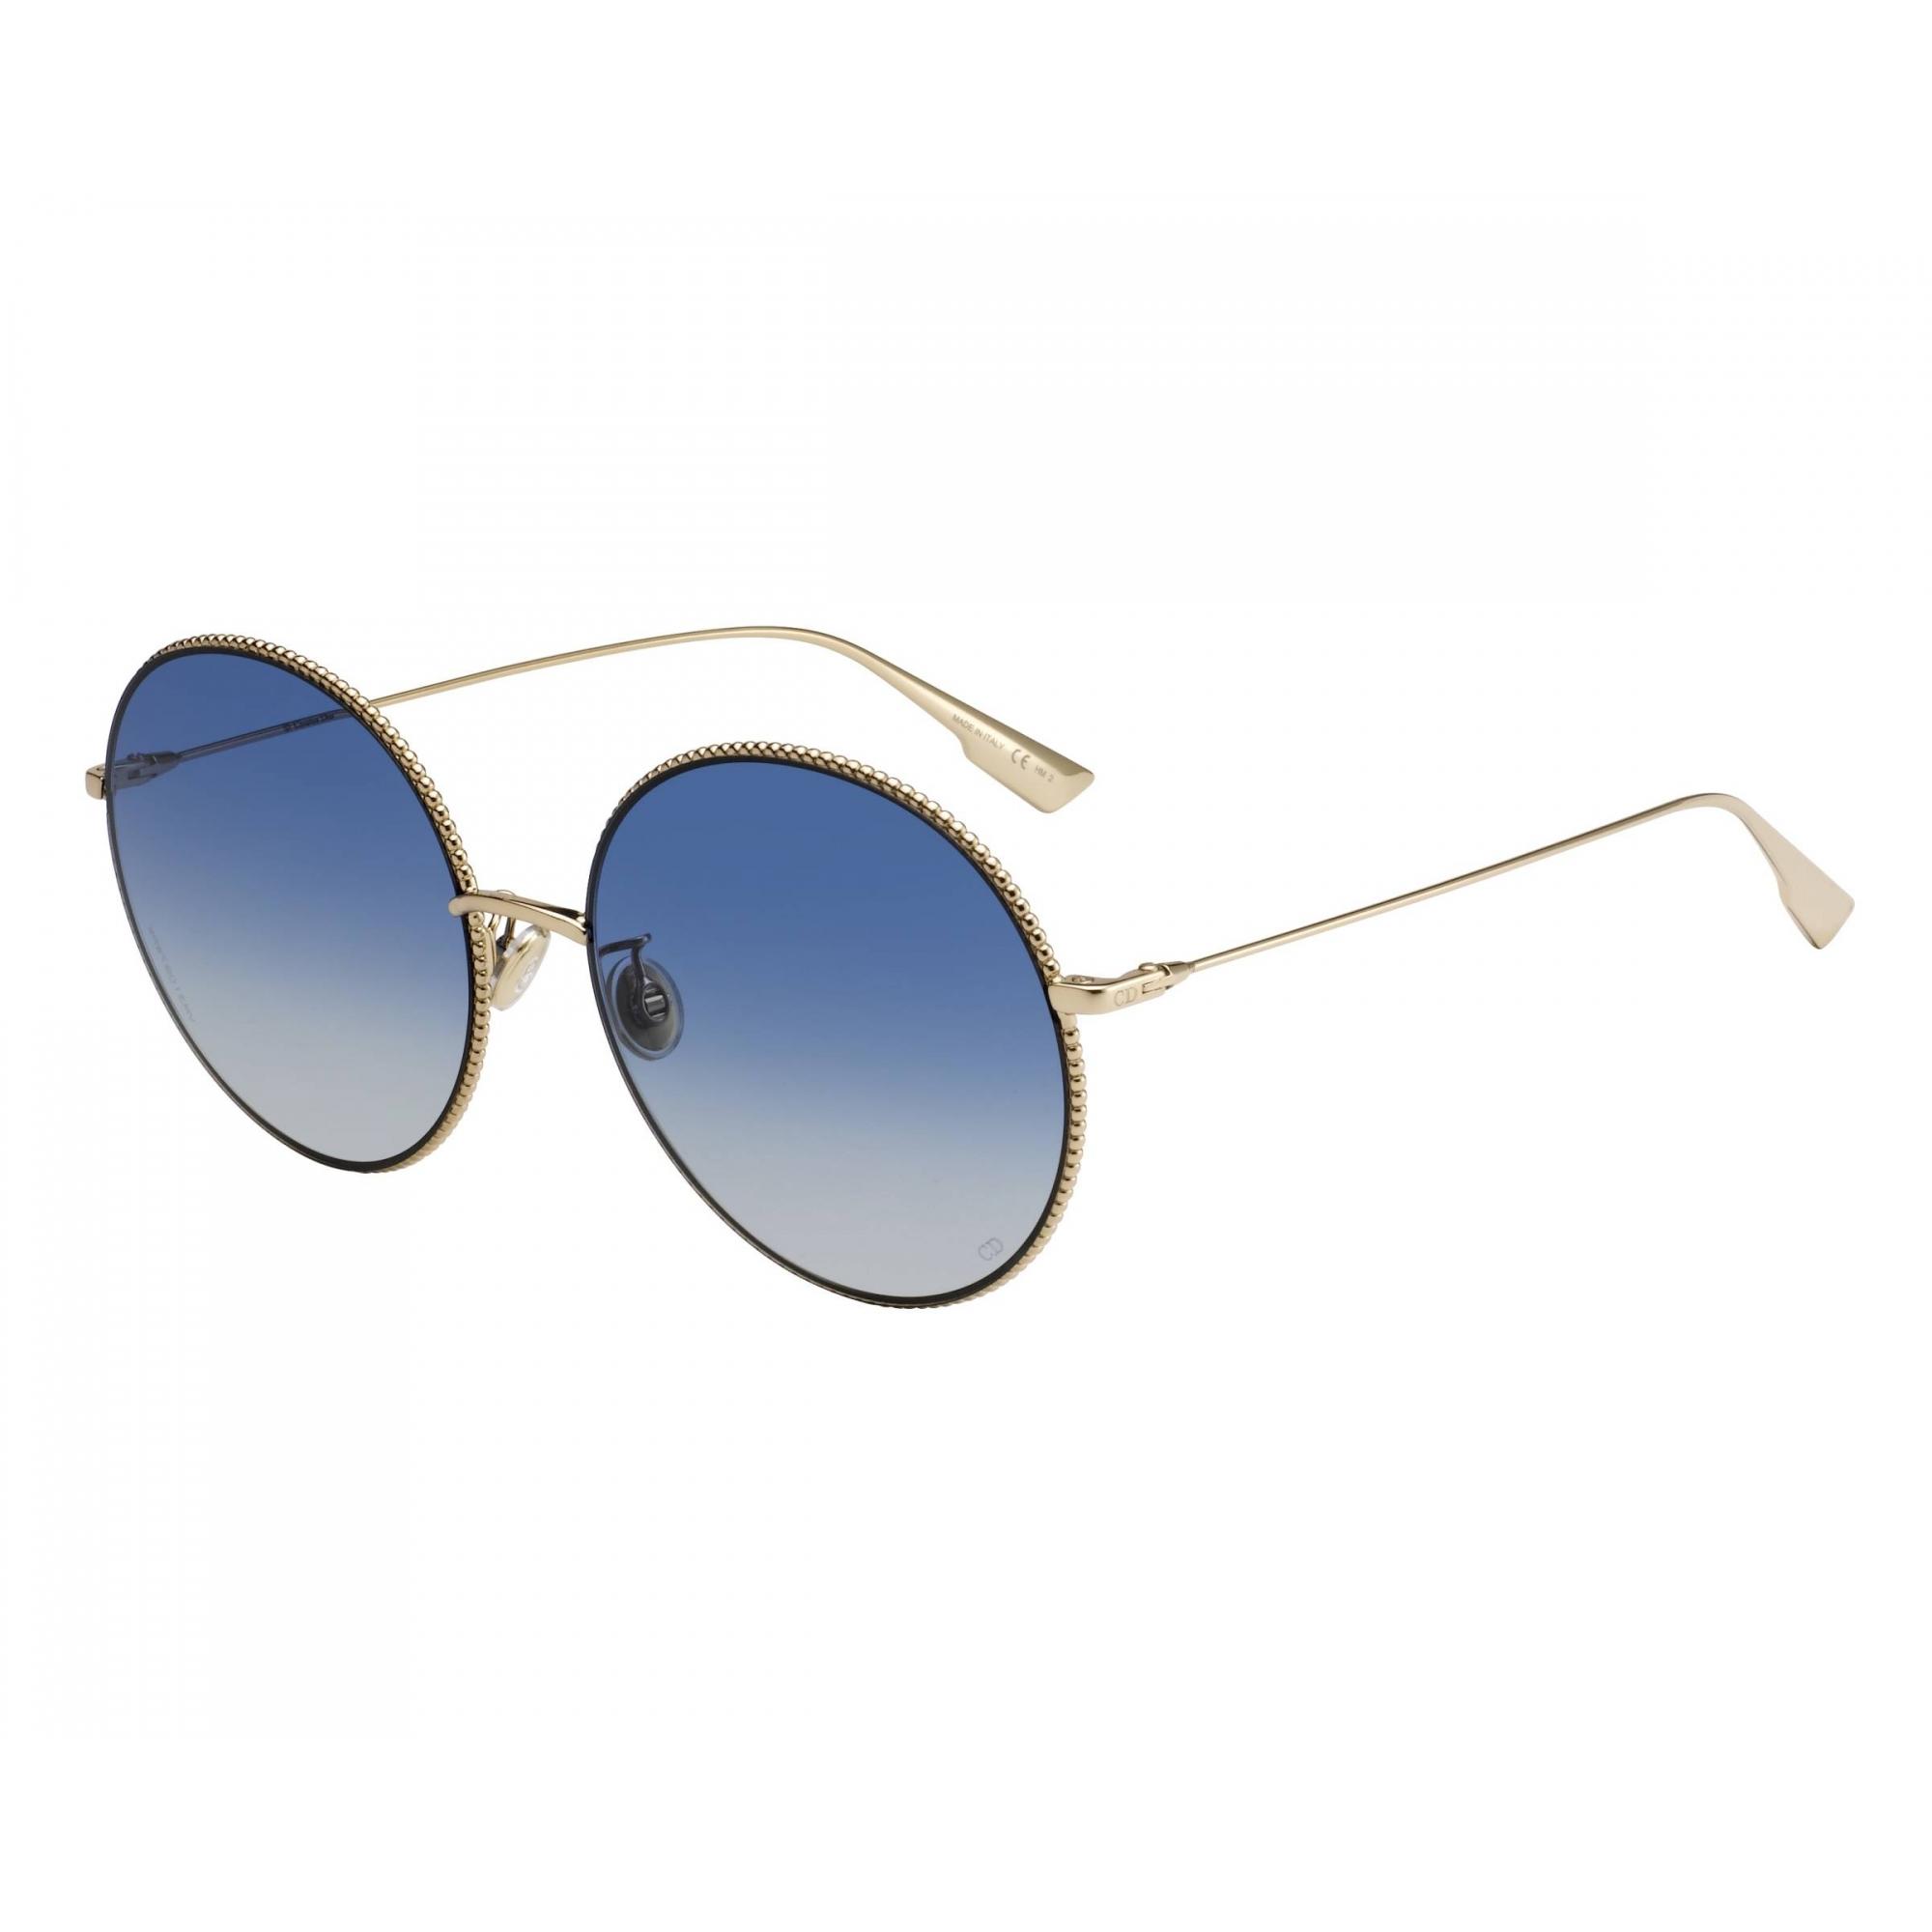 Óculos de Sol Dior Dourado/Azul DIORSOCIETY 2F - J5G/84/60